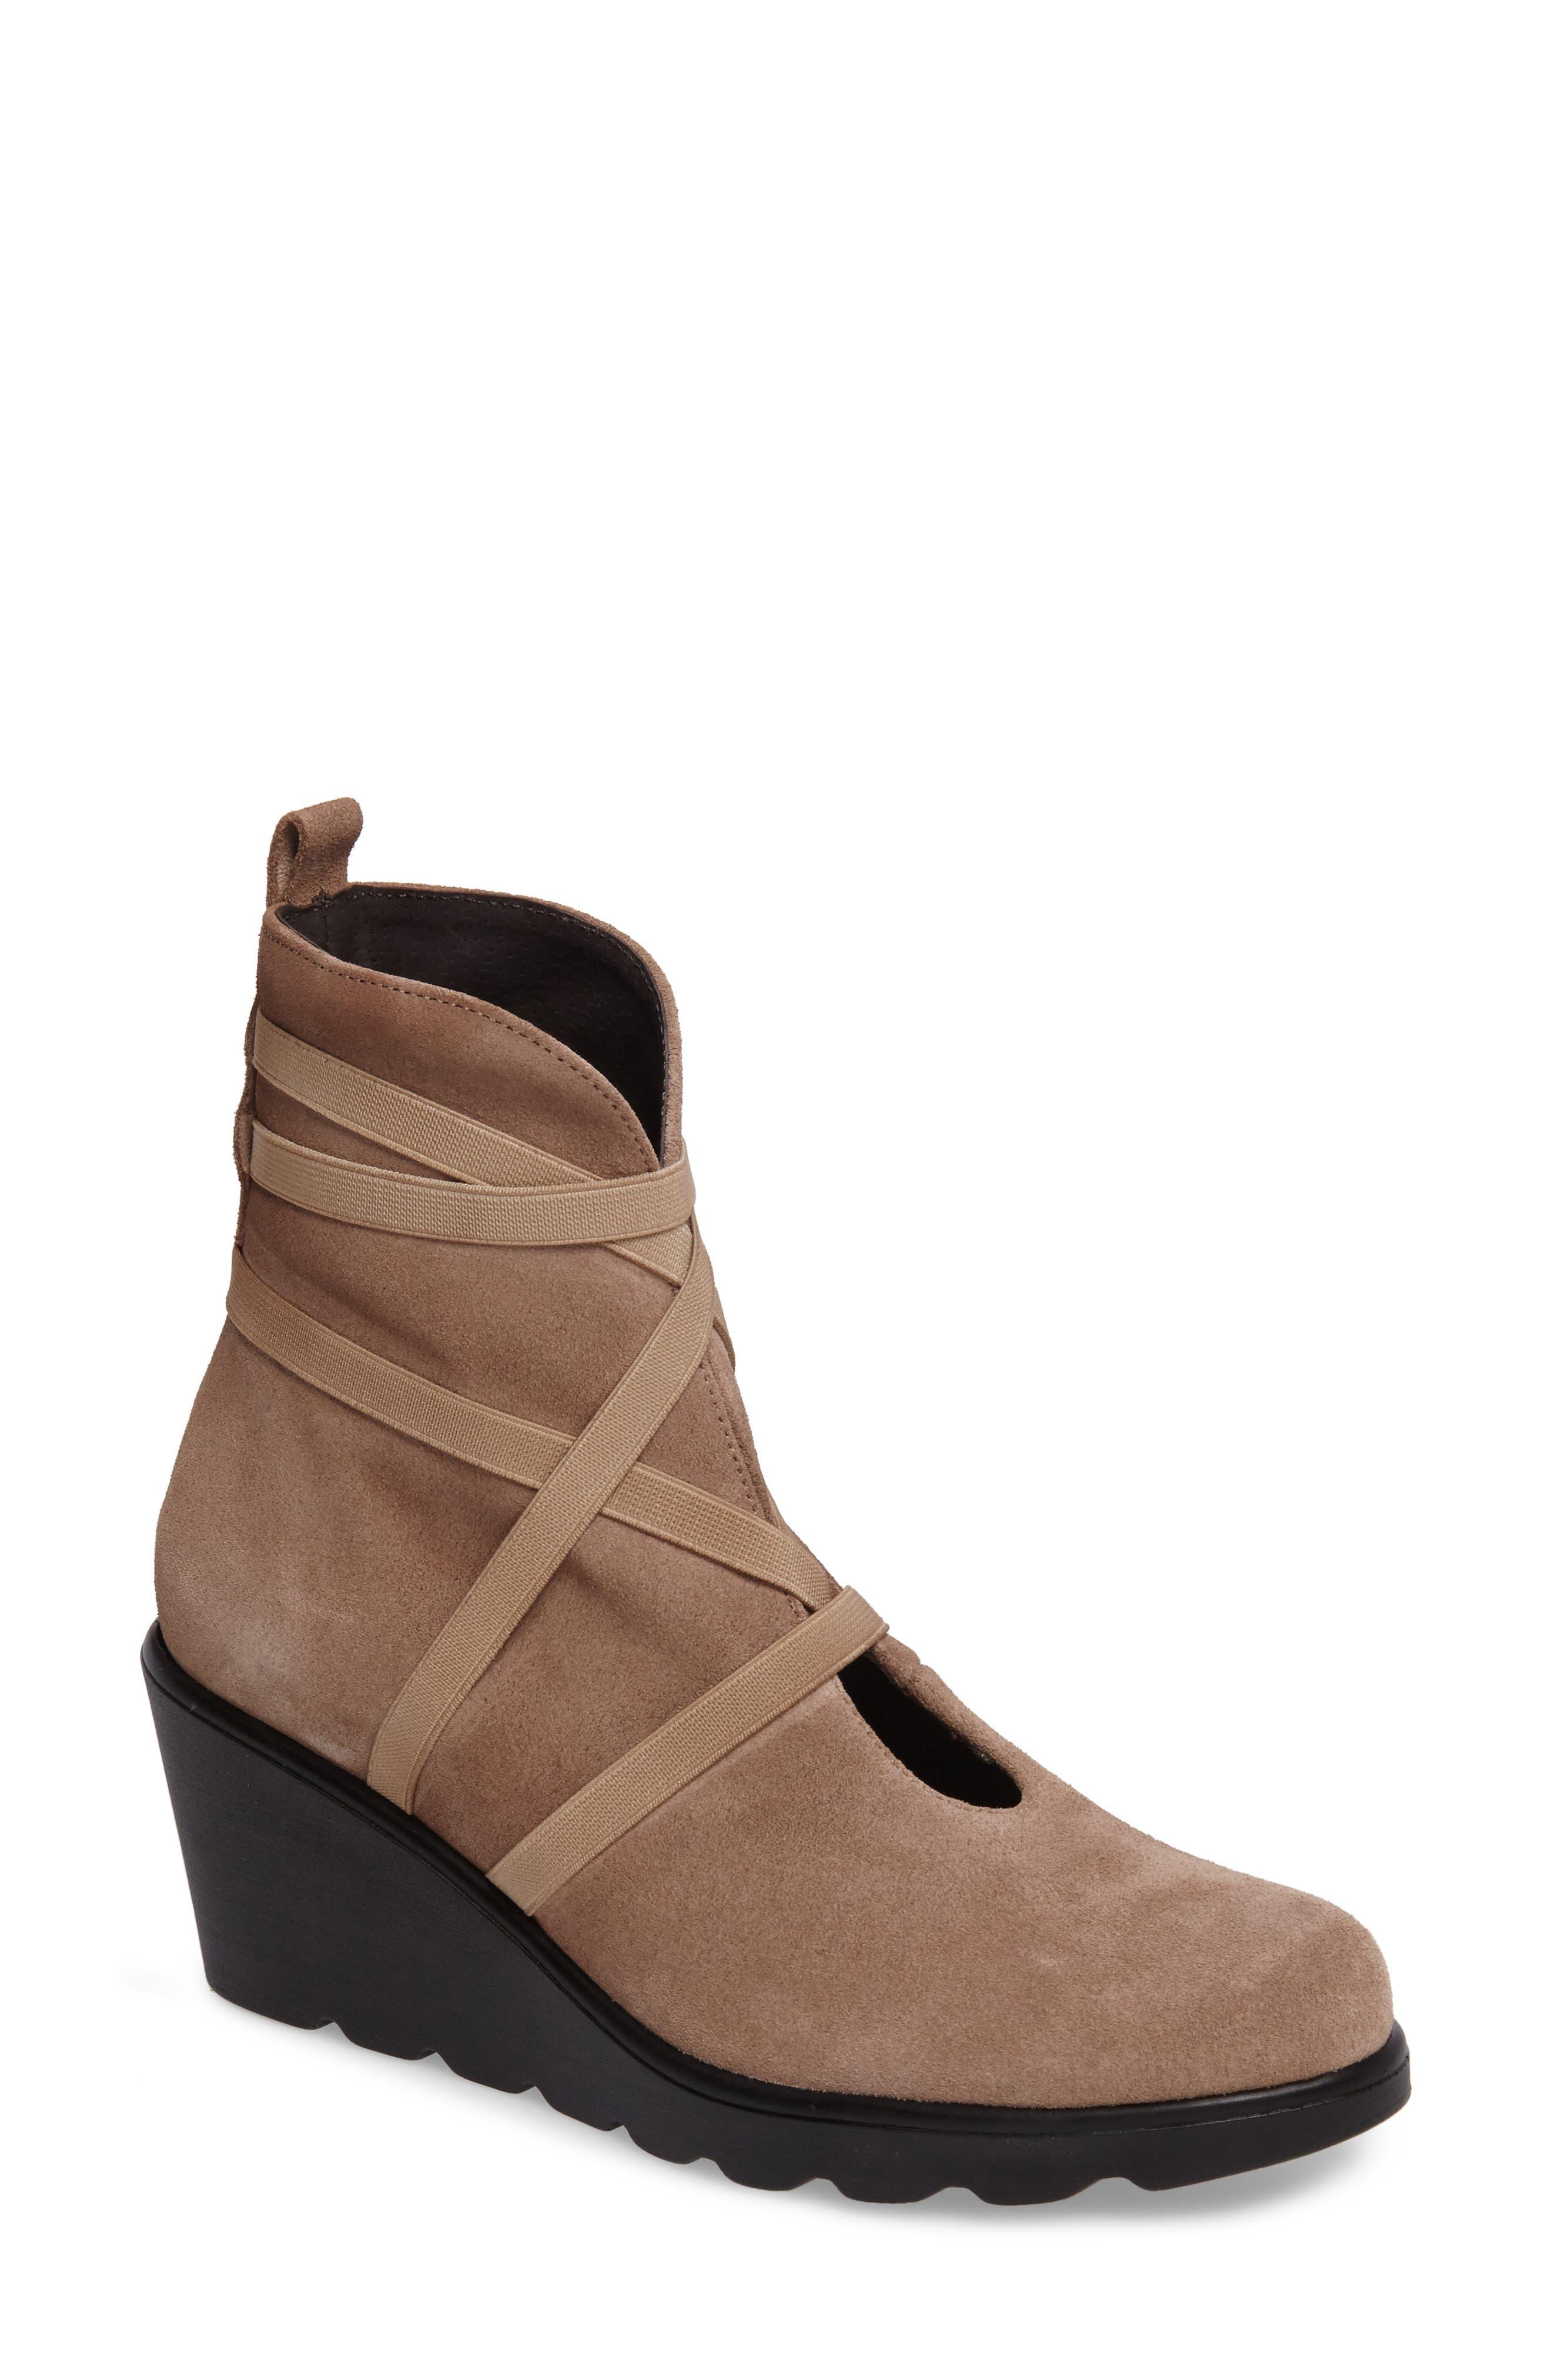 Toni Pons Blanca Wedge Boot (Women)